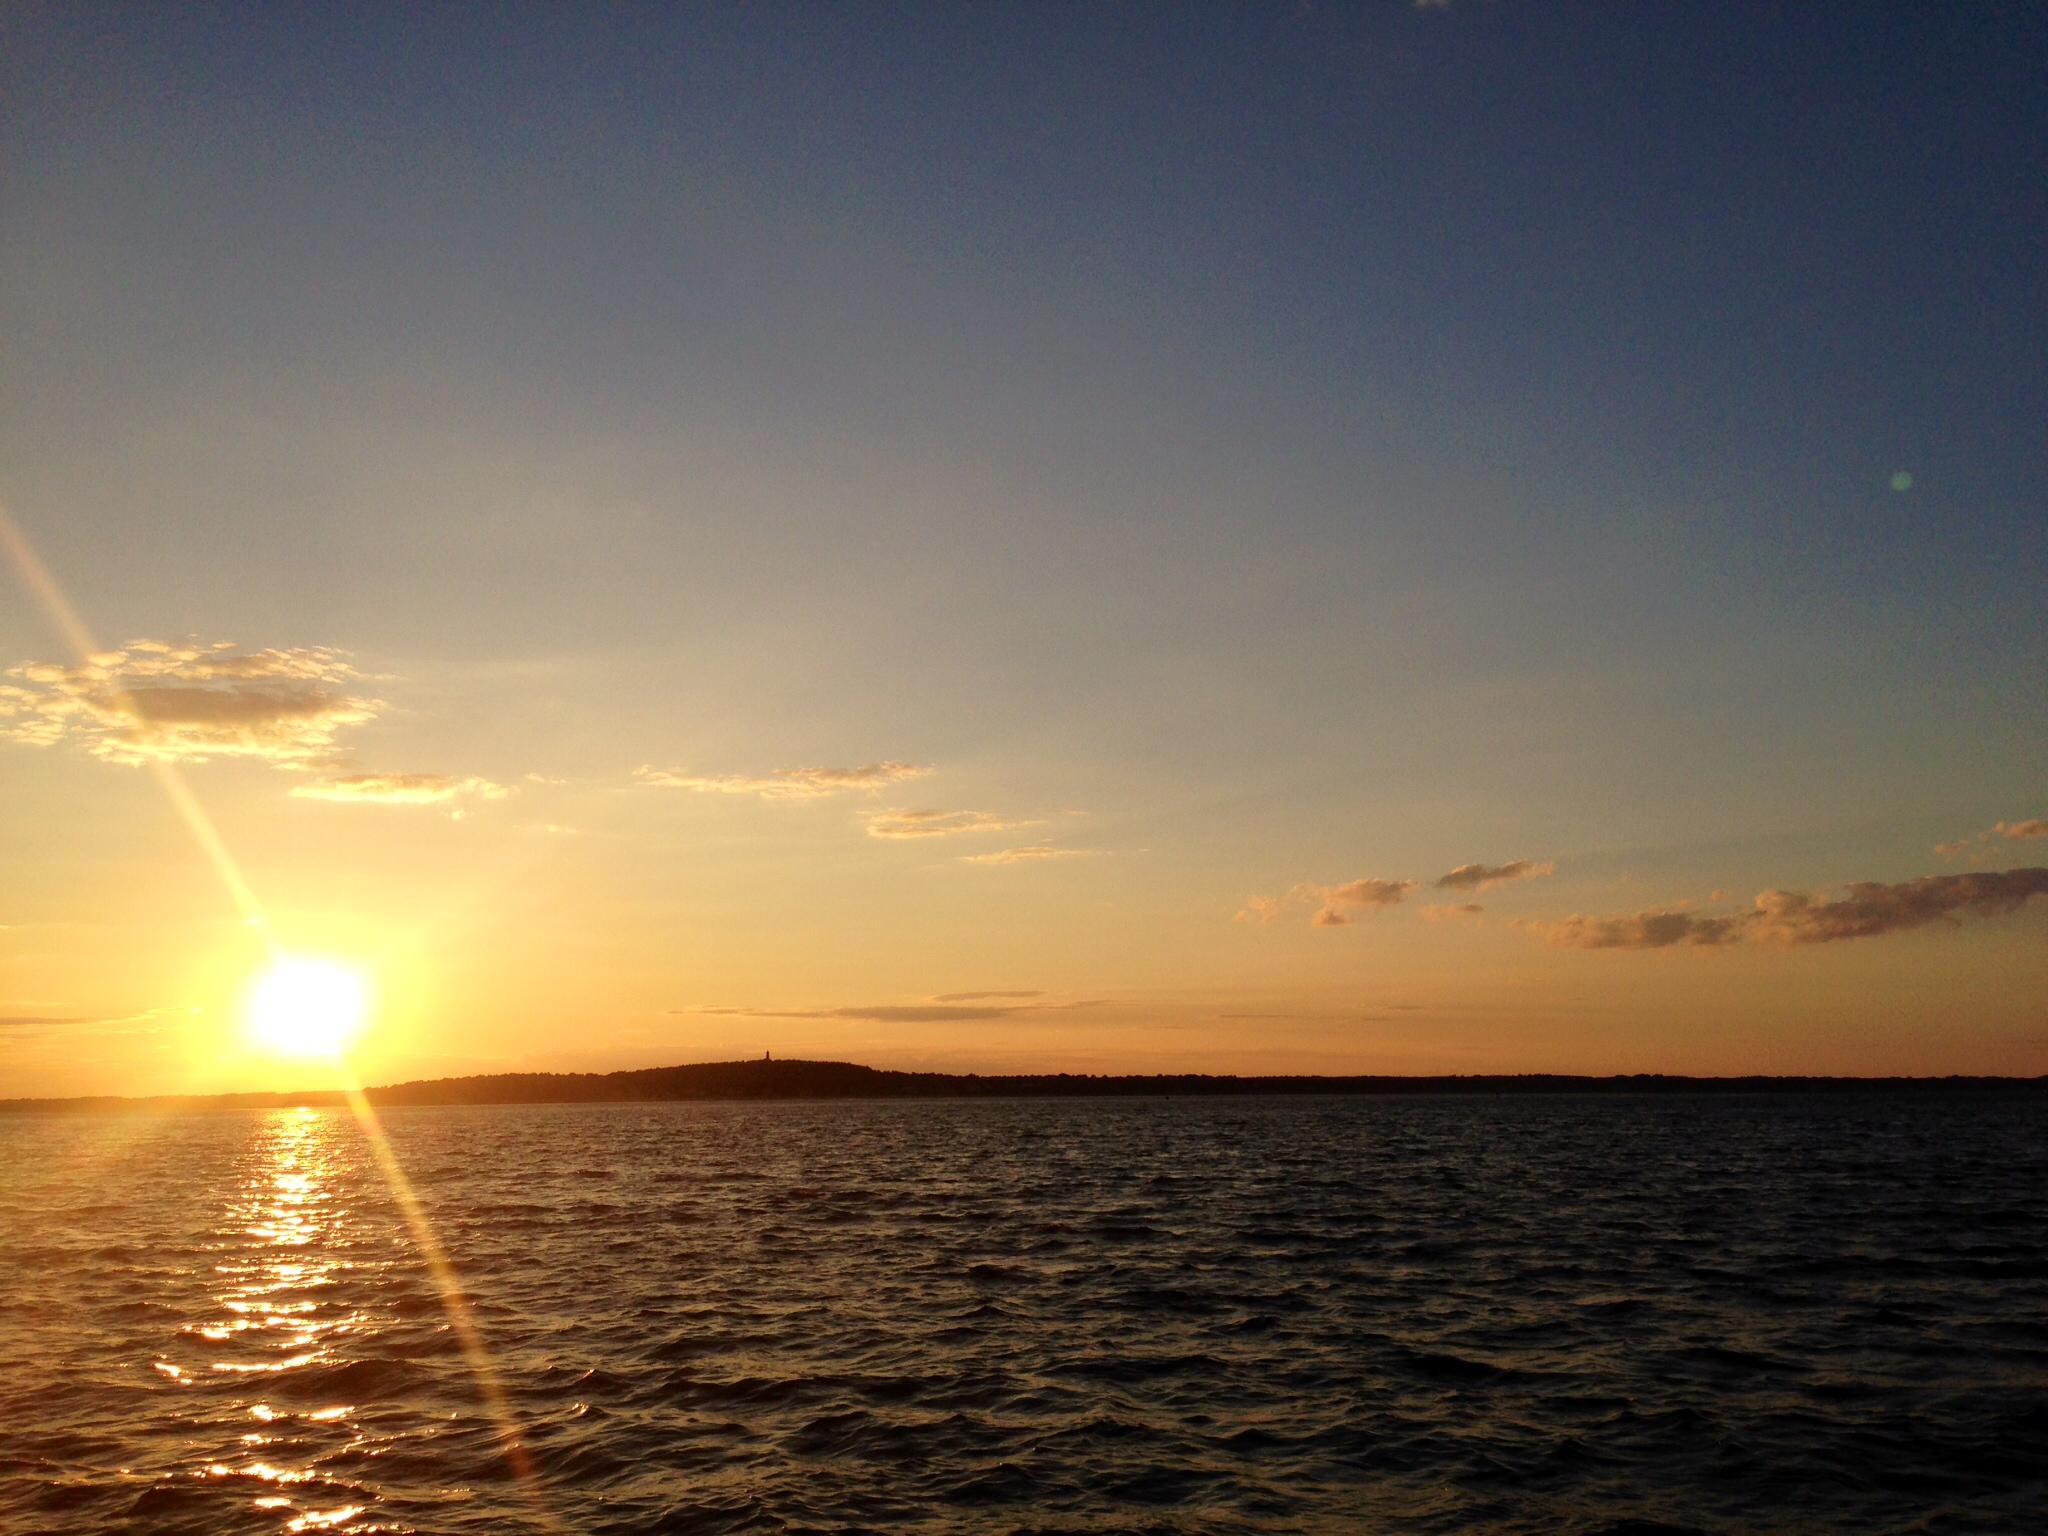 The sunset on Duxbury Bay- Duxbury Massachusetts